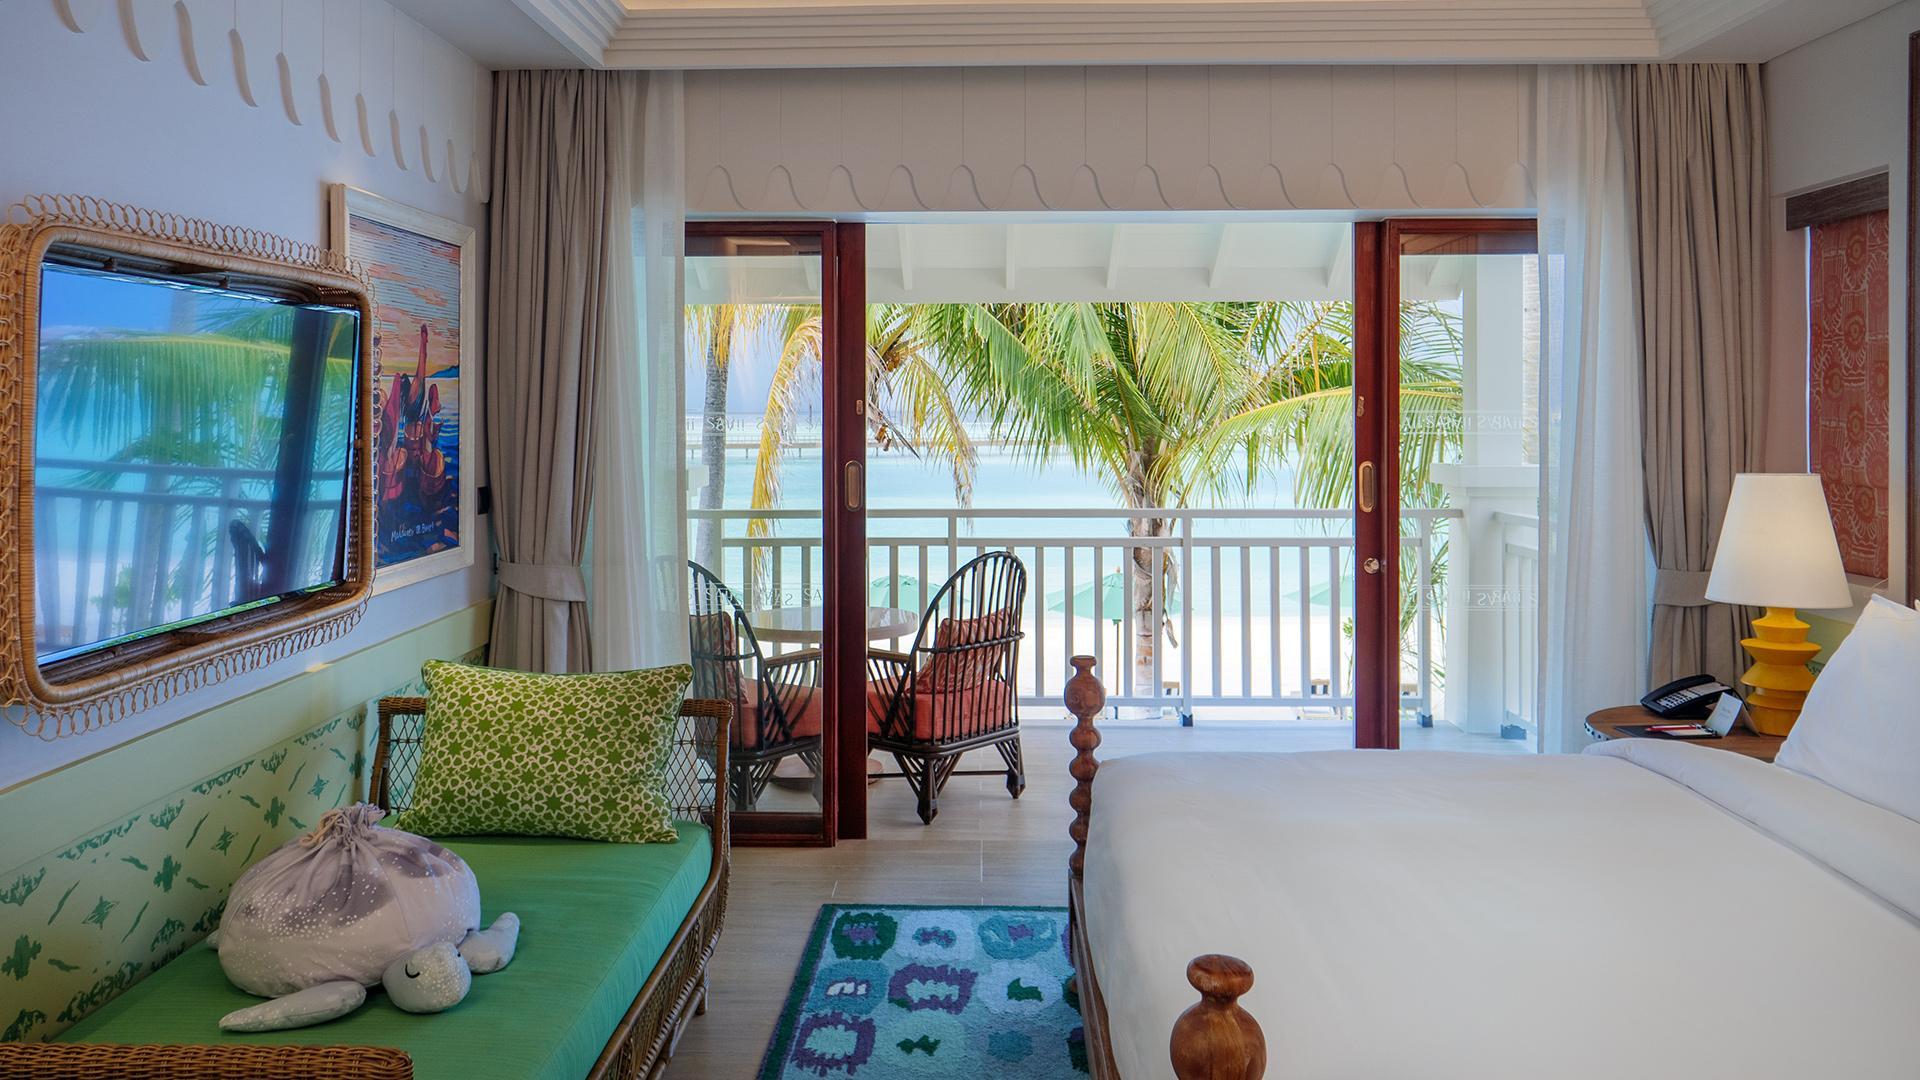 Sky Room NOV2020 image 1 at SAii Lagoon Maldives, Curio Collection by Hilton  by Kaafu Atoll, North Central Province, Maldives